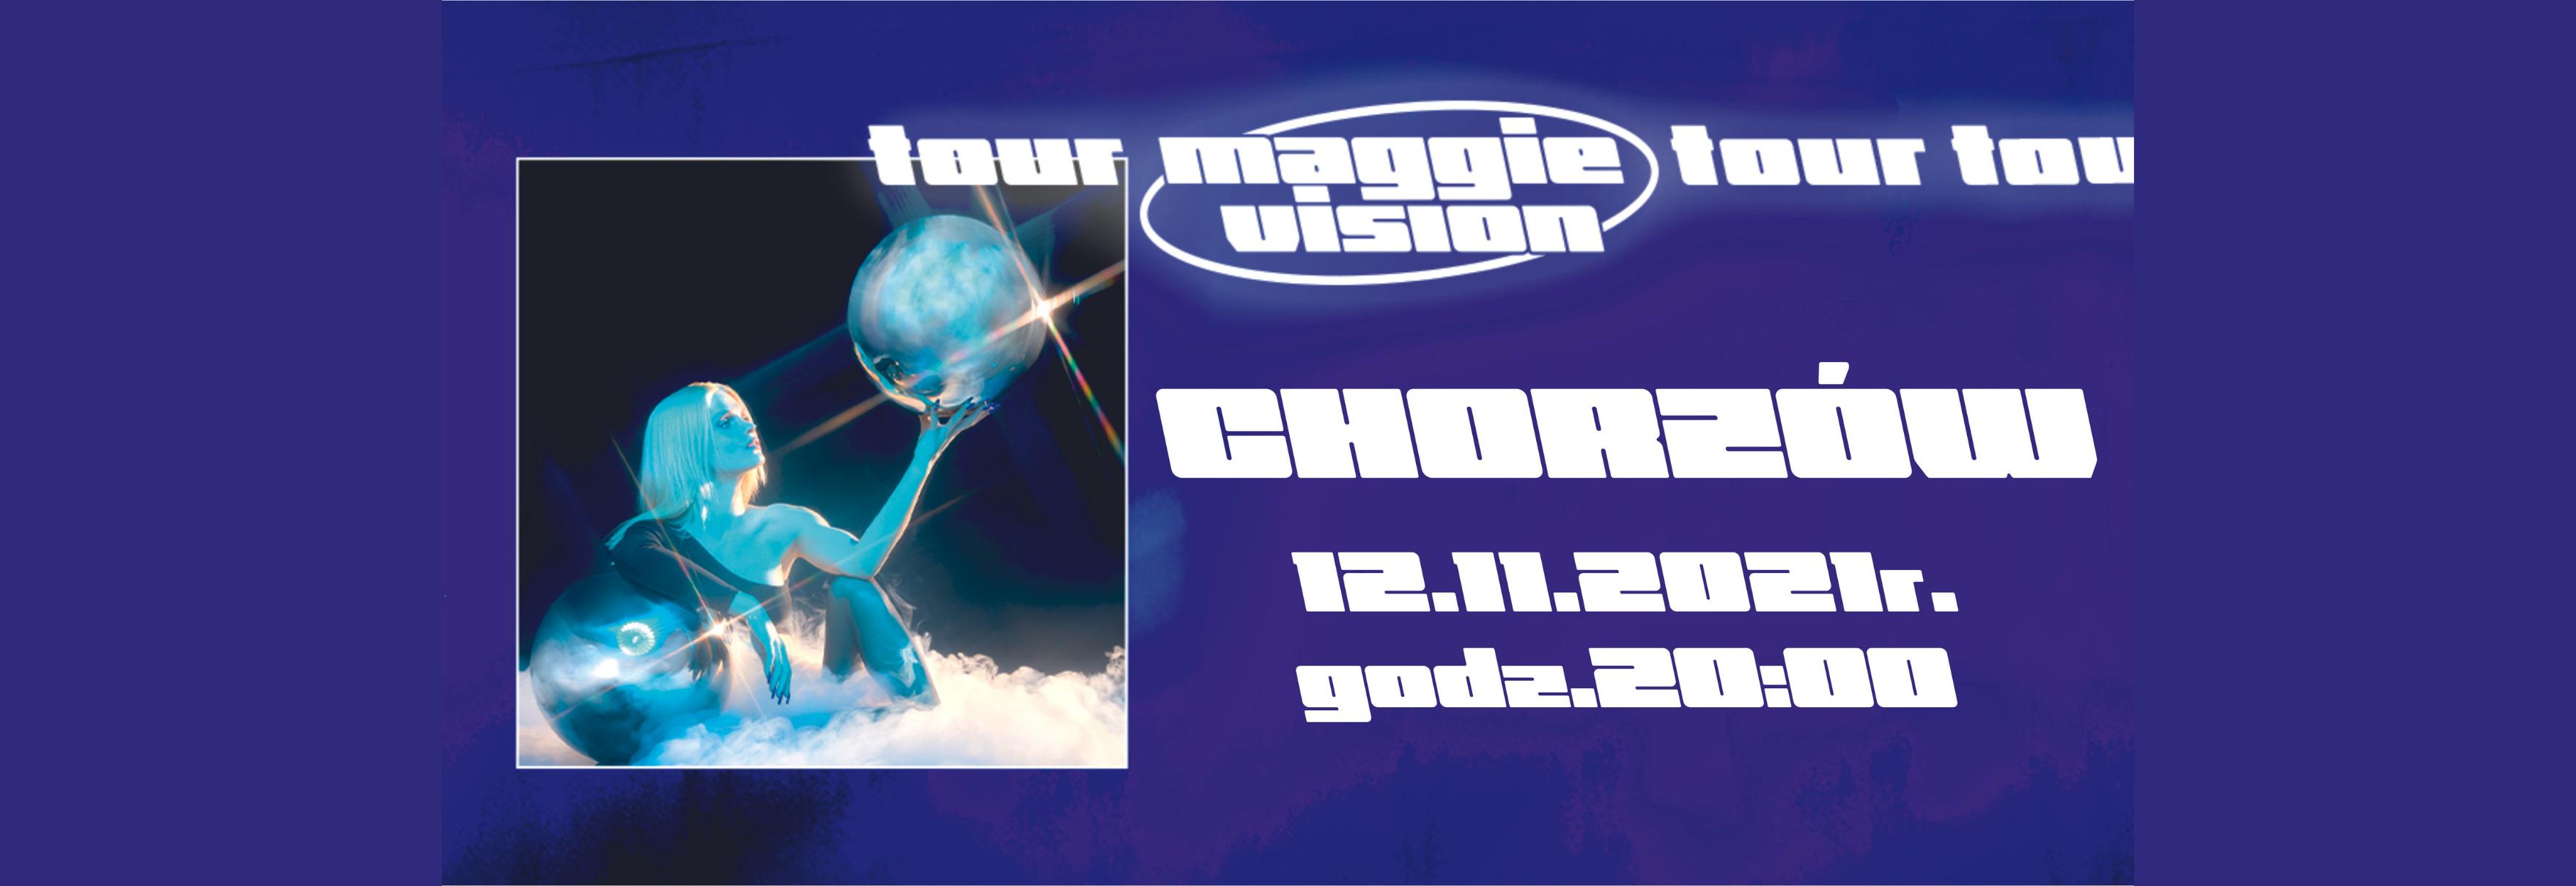 l Margaret - Maggie Vision Tour / Chorzów